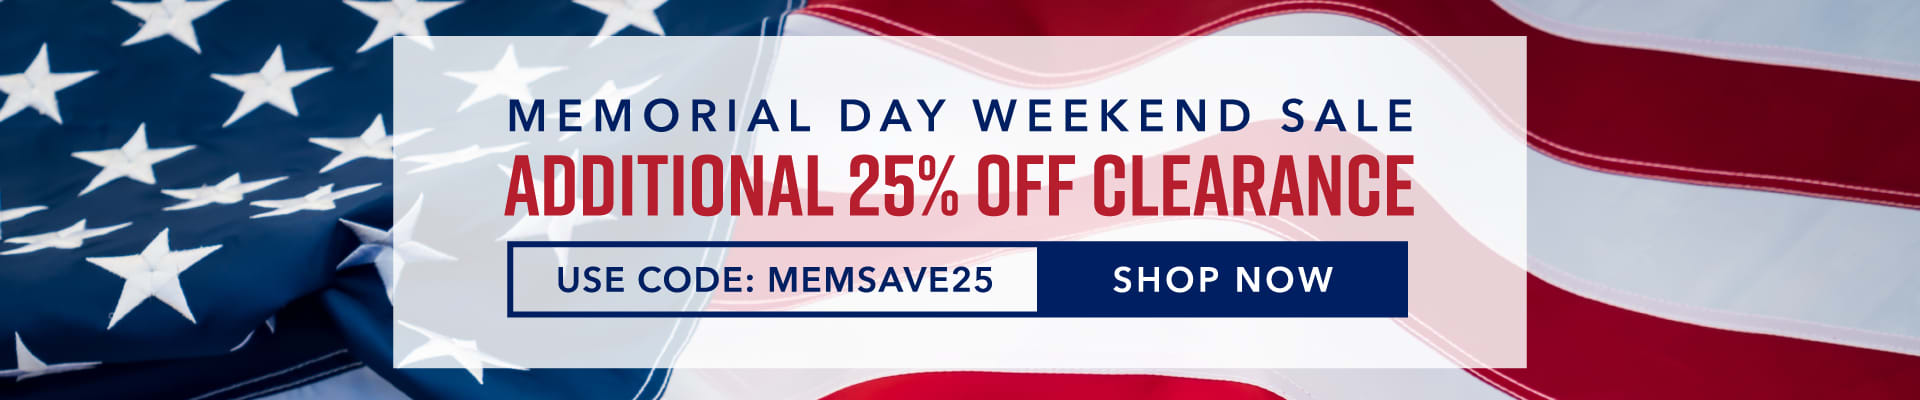 Shop Memorial Day Weekend Sale